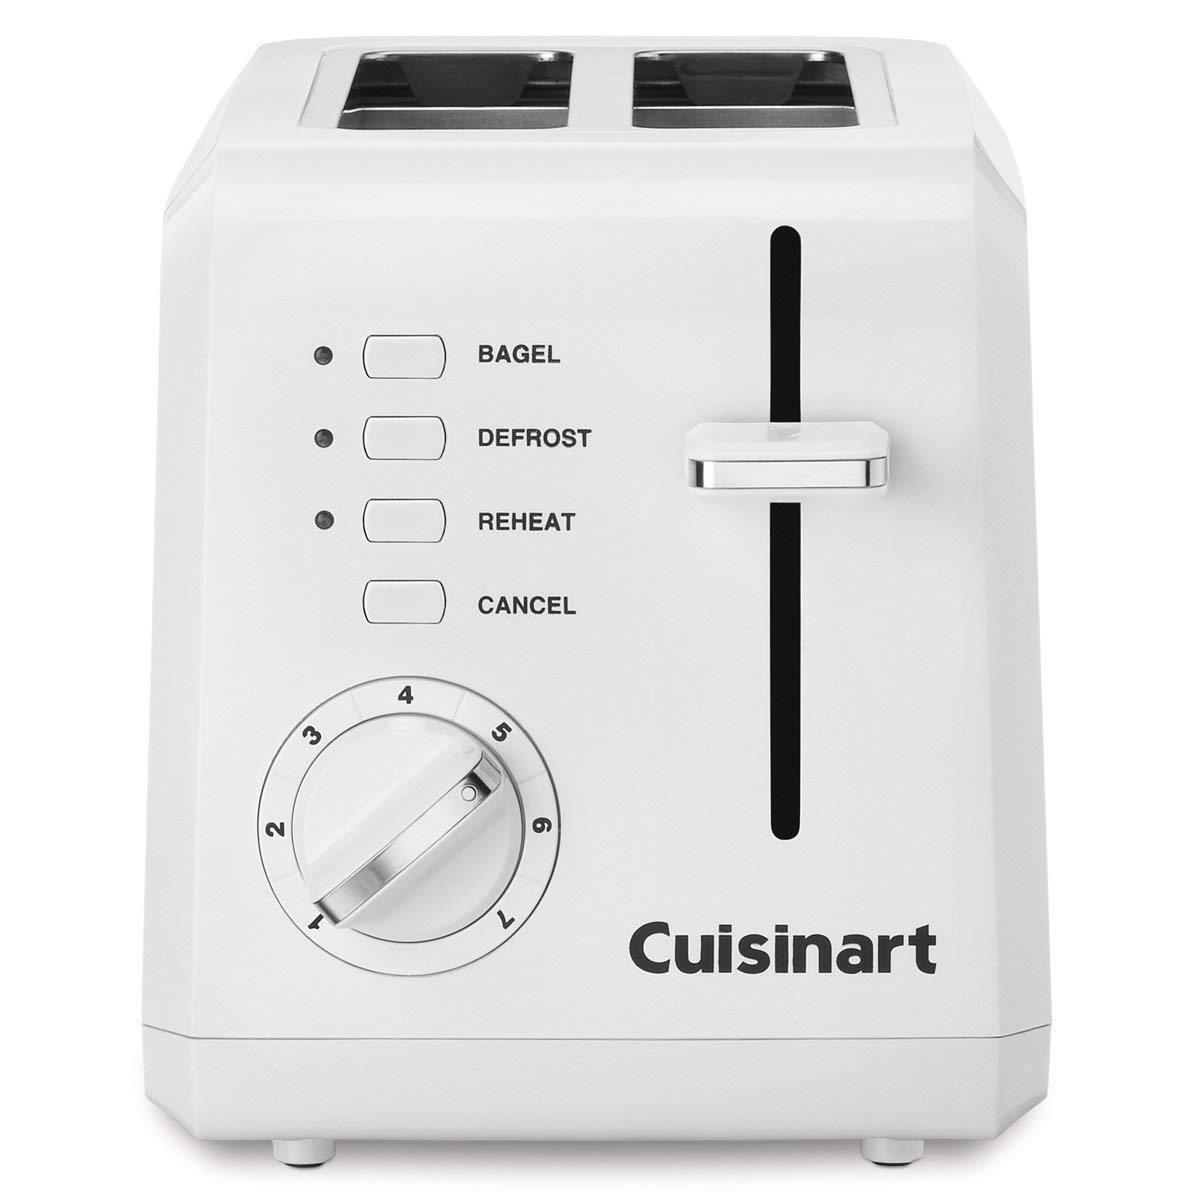 100% GENUINE!!! Cuisinart CPT-122 2-Slice Compact Plastic To